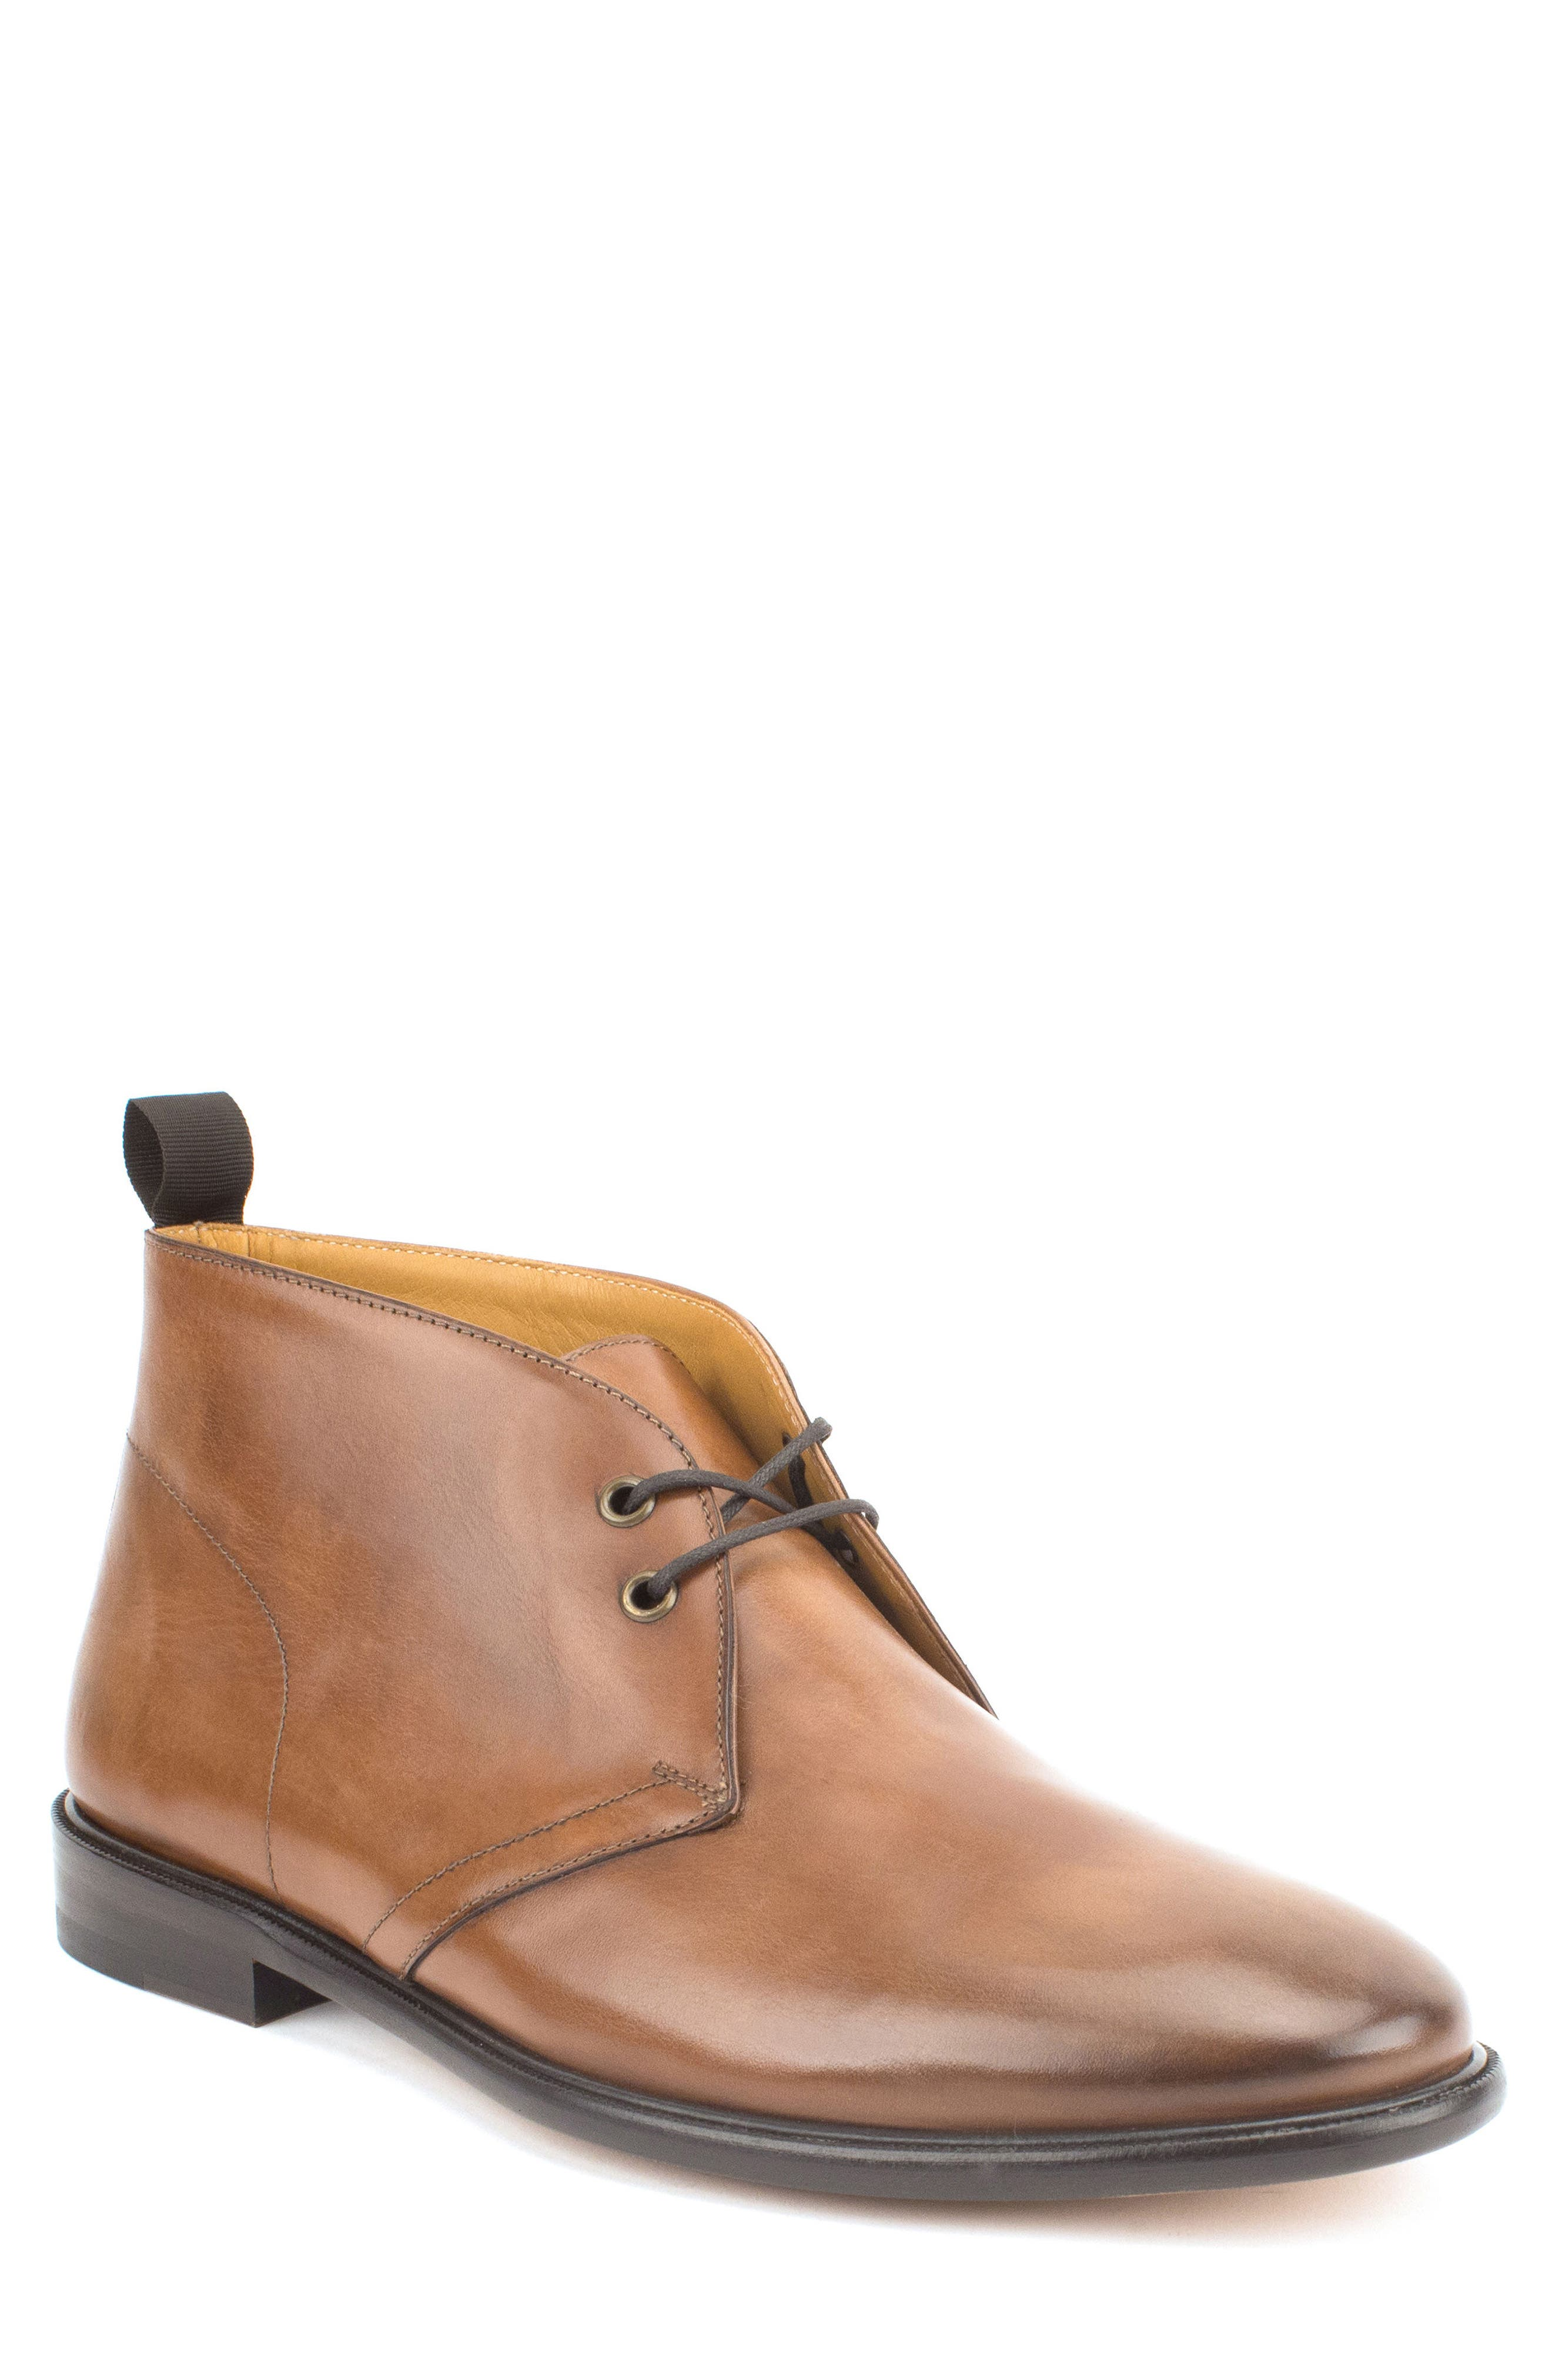 Desmond Chukka Boot,                         Main,                         color, 213